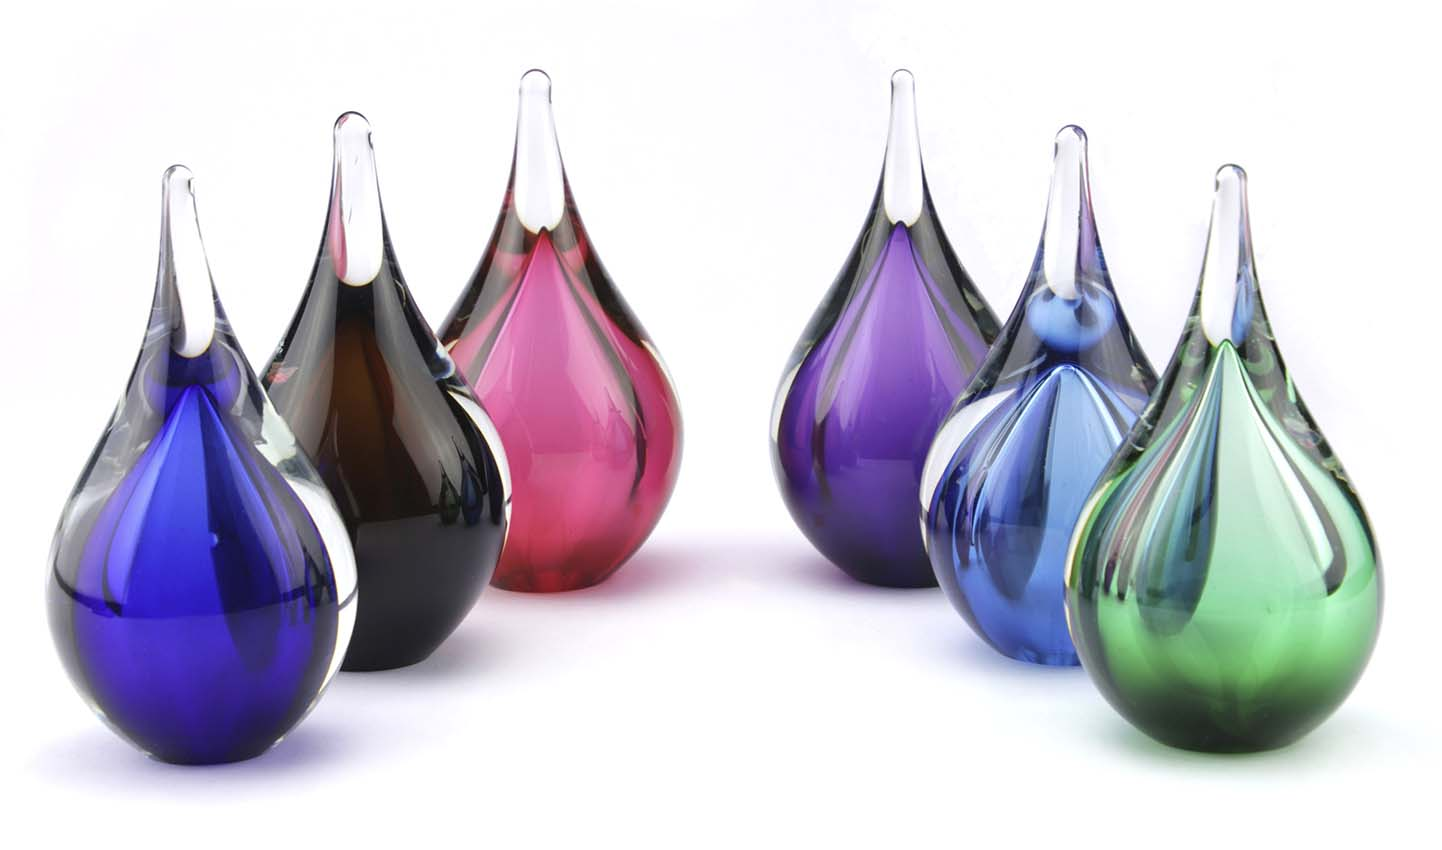 Kristalglazen 3D Mini Traan Urn Rozegoud (0.05 liter)